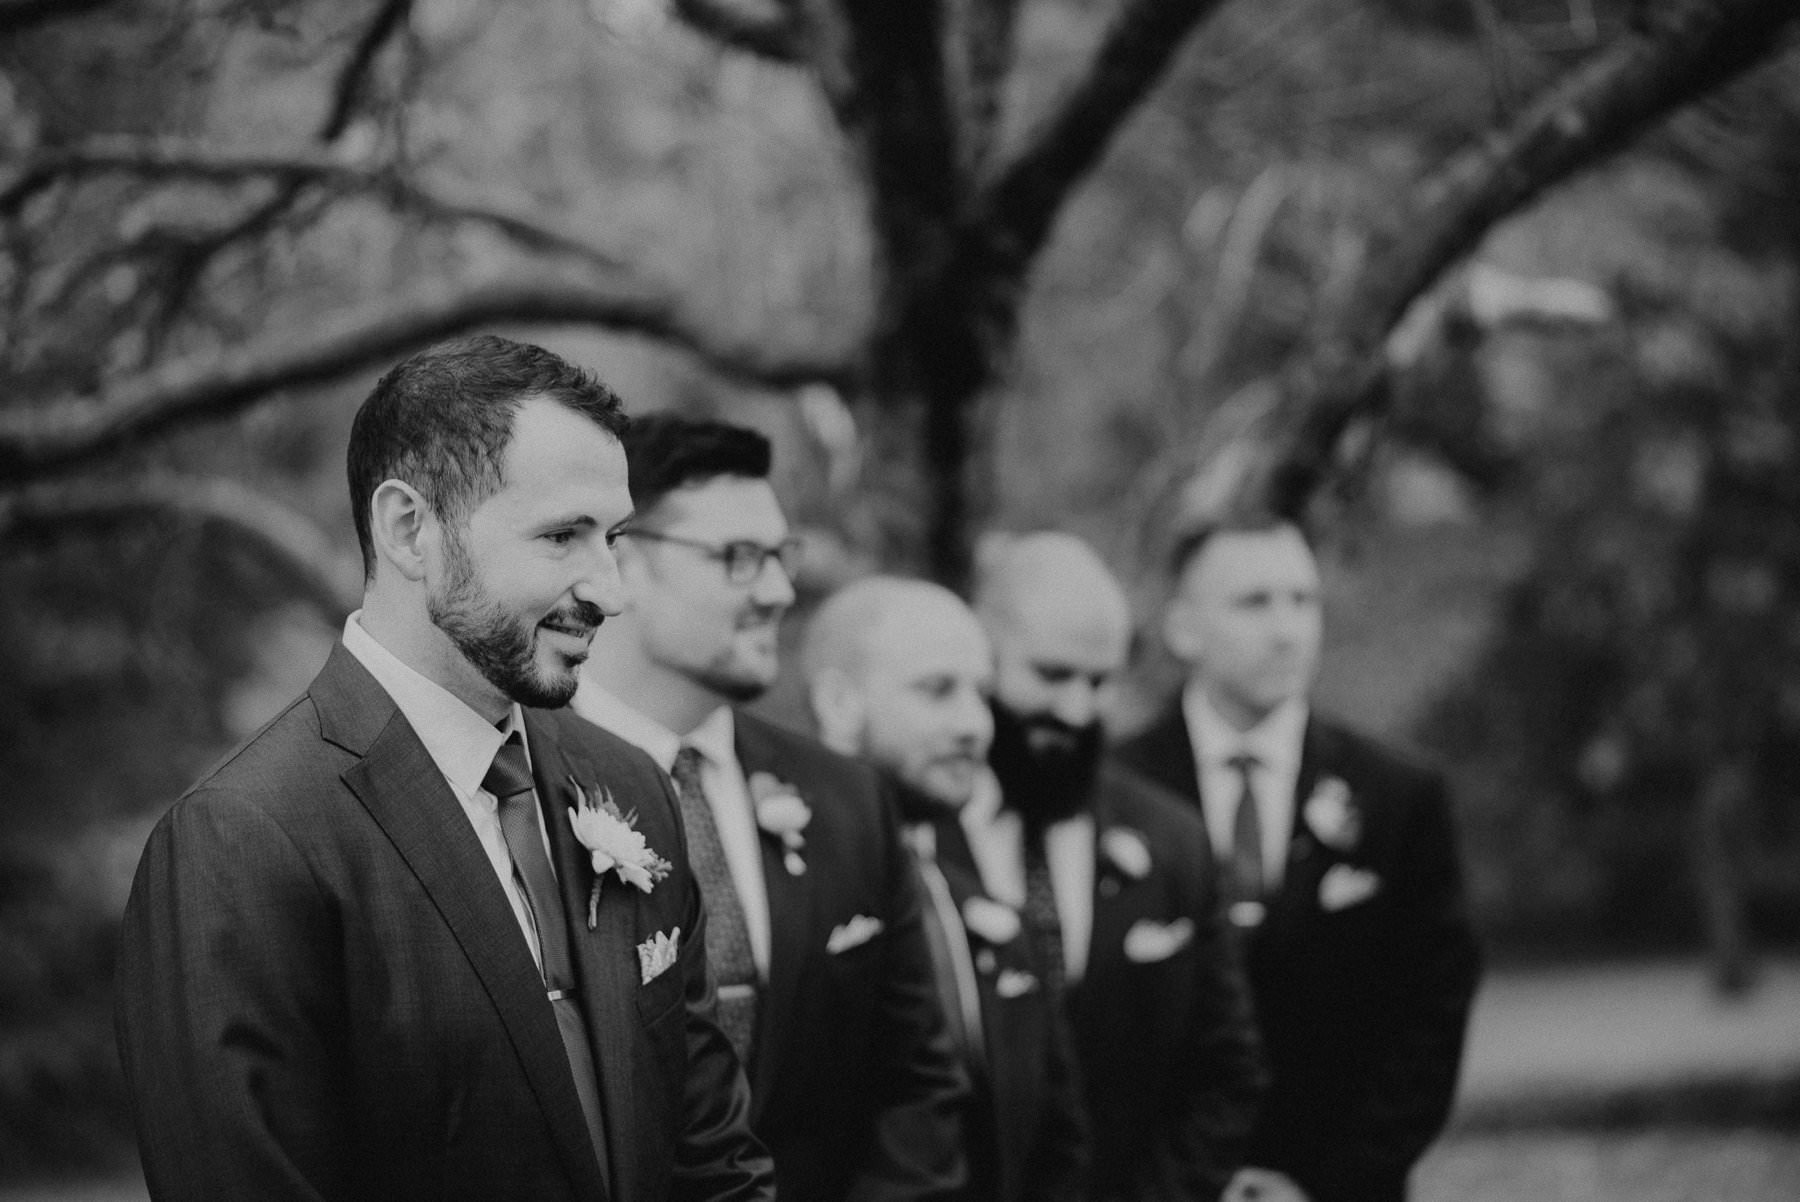 John_James_Audubon_Center_wedding-39.jpg